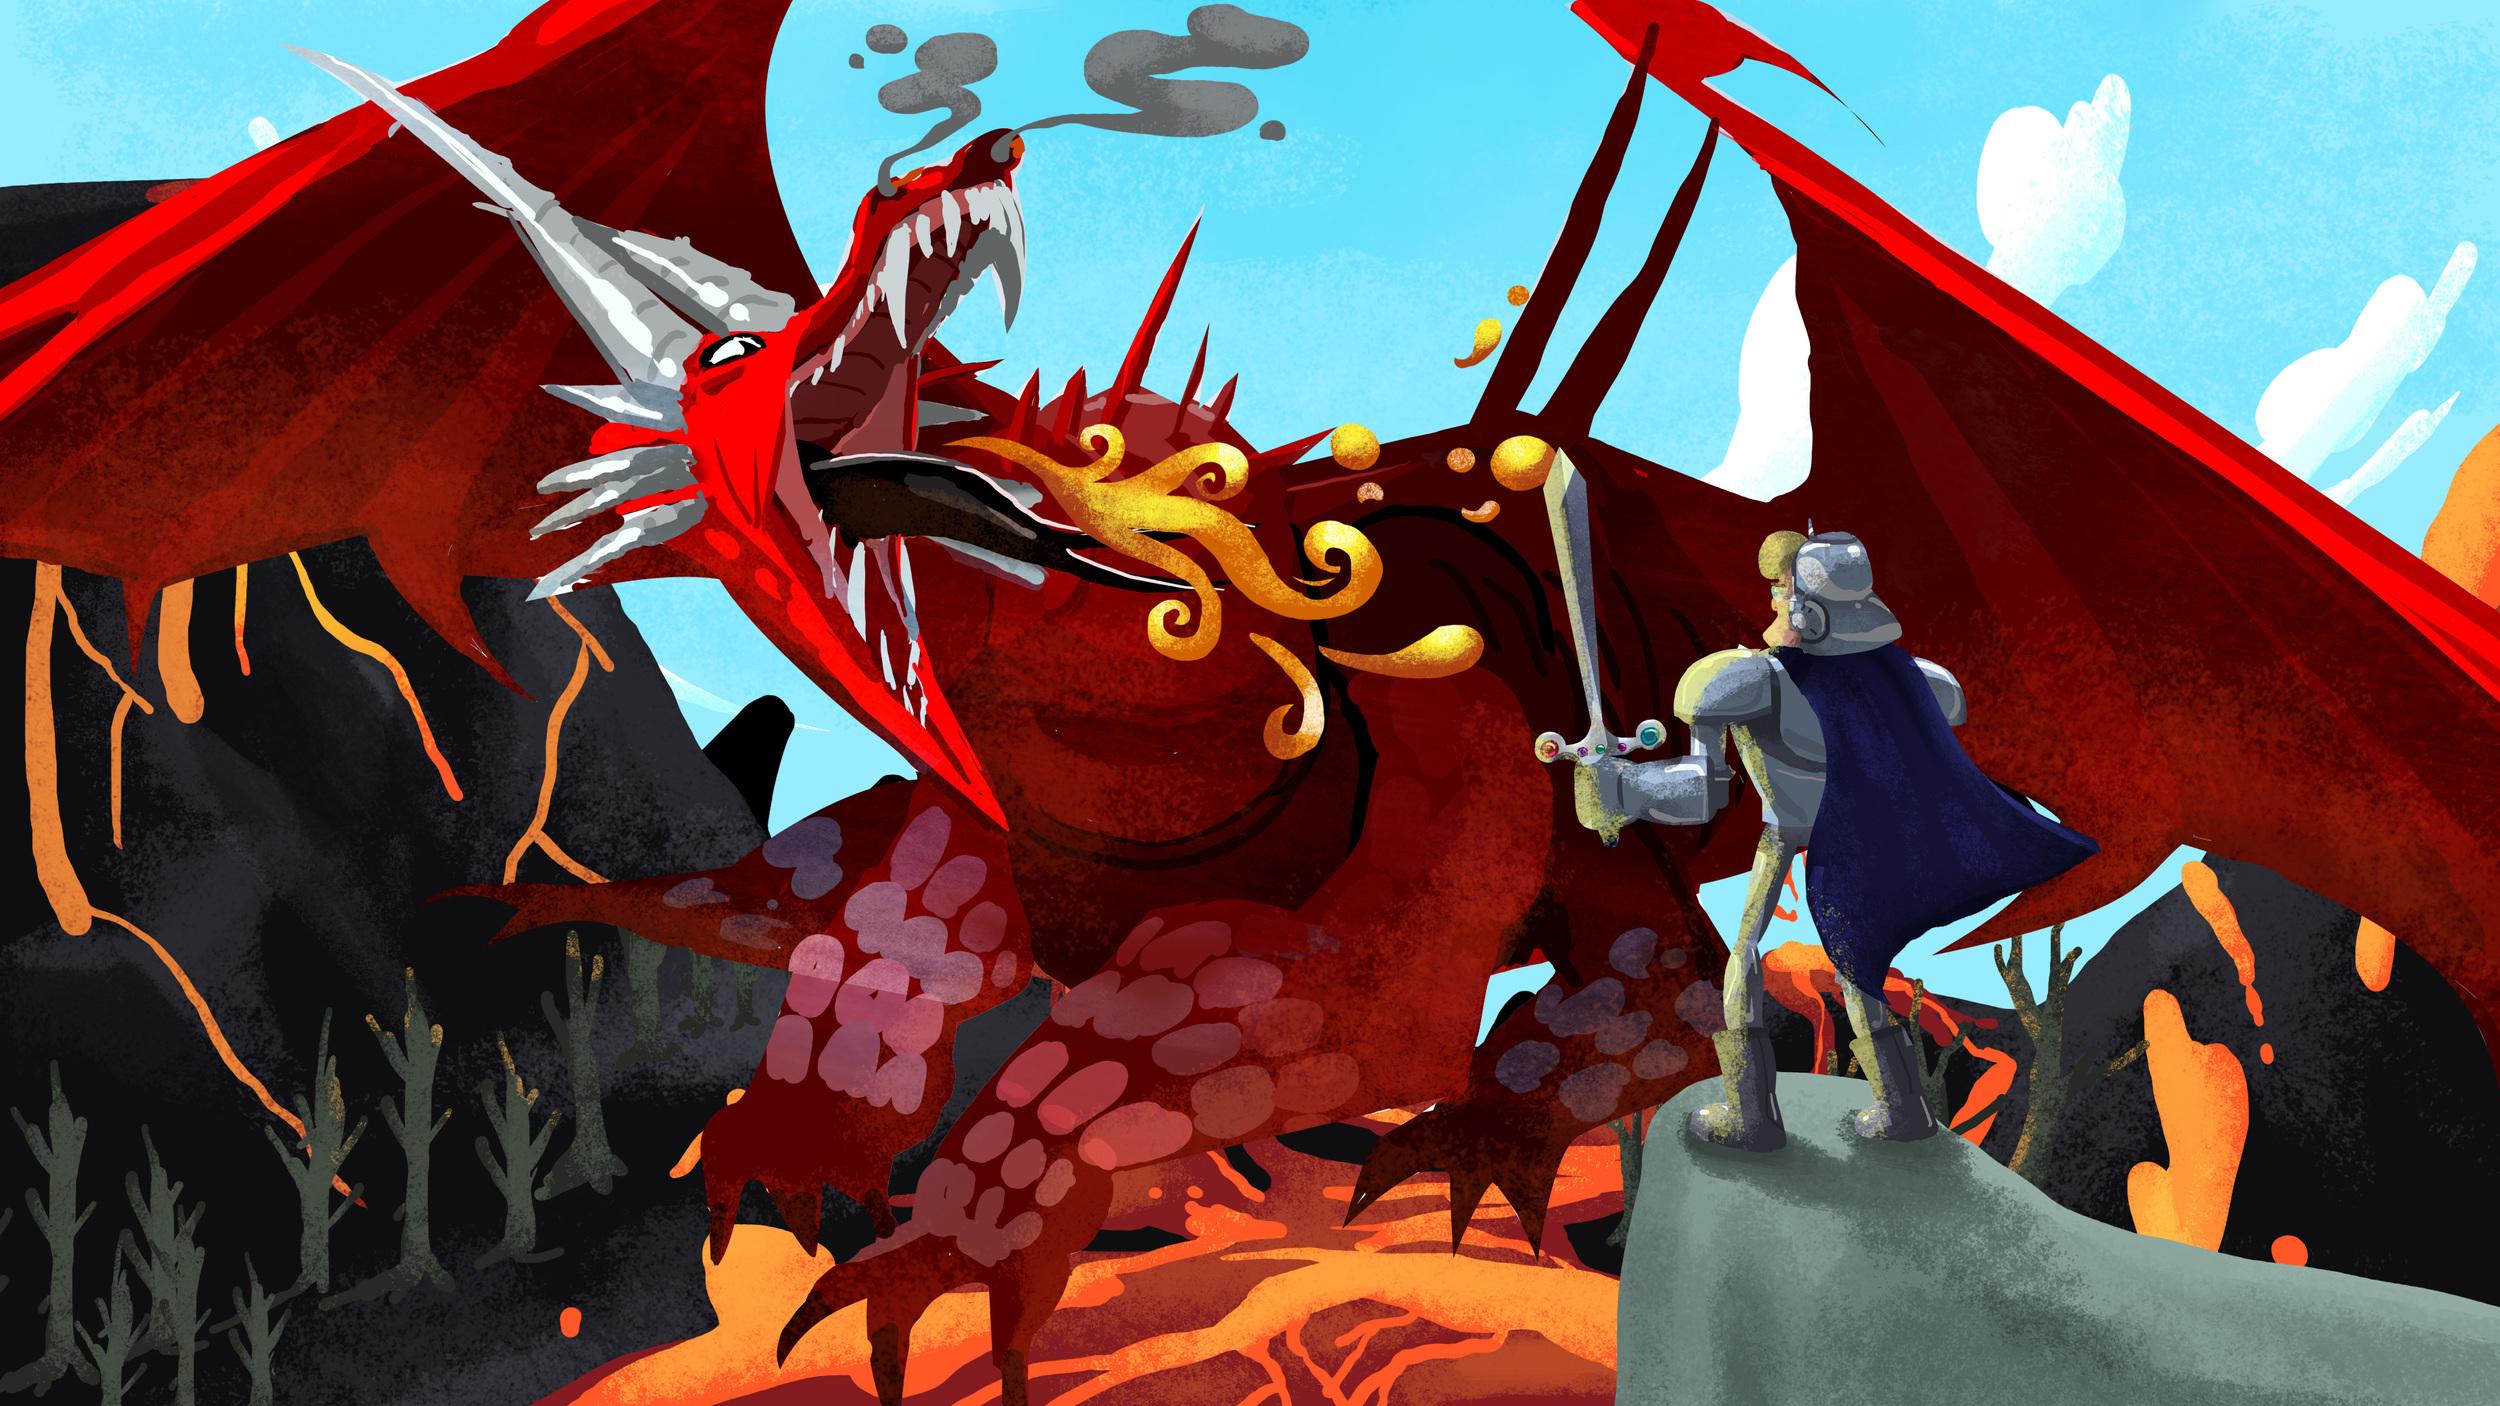 Intel_Mobile_dragon_volcano_01.jpg